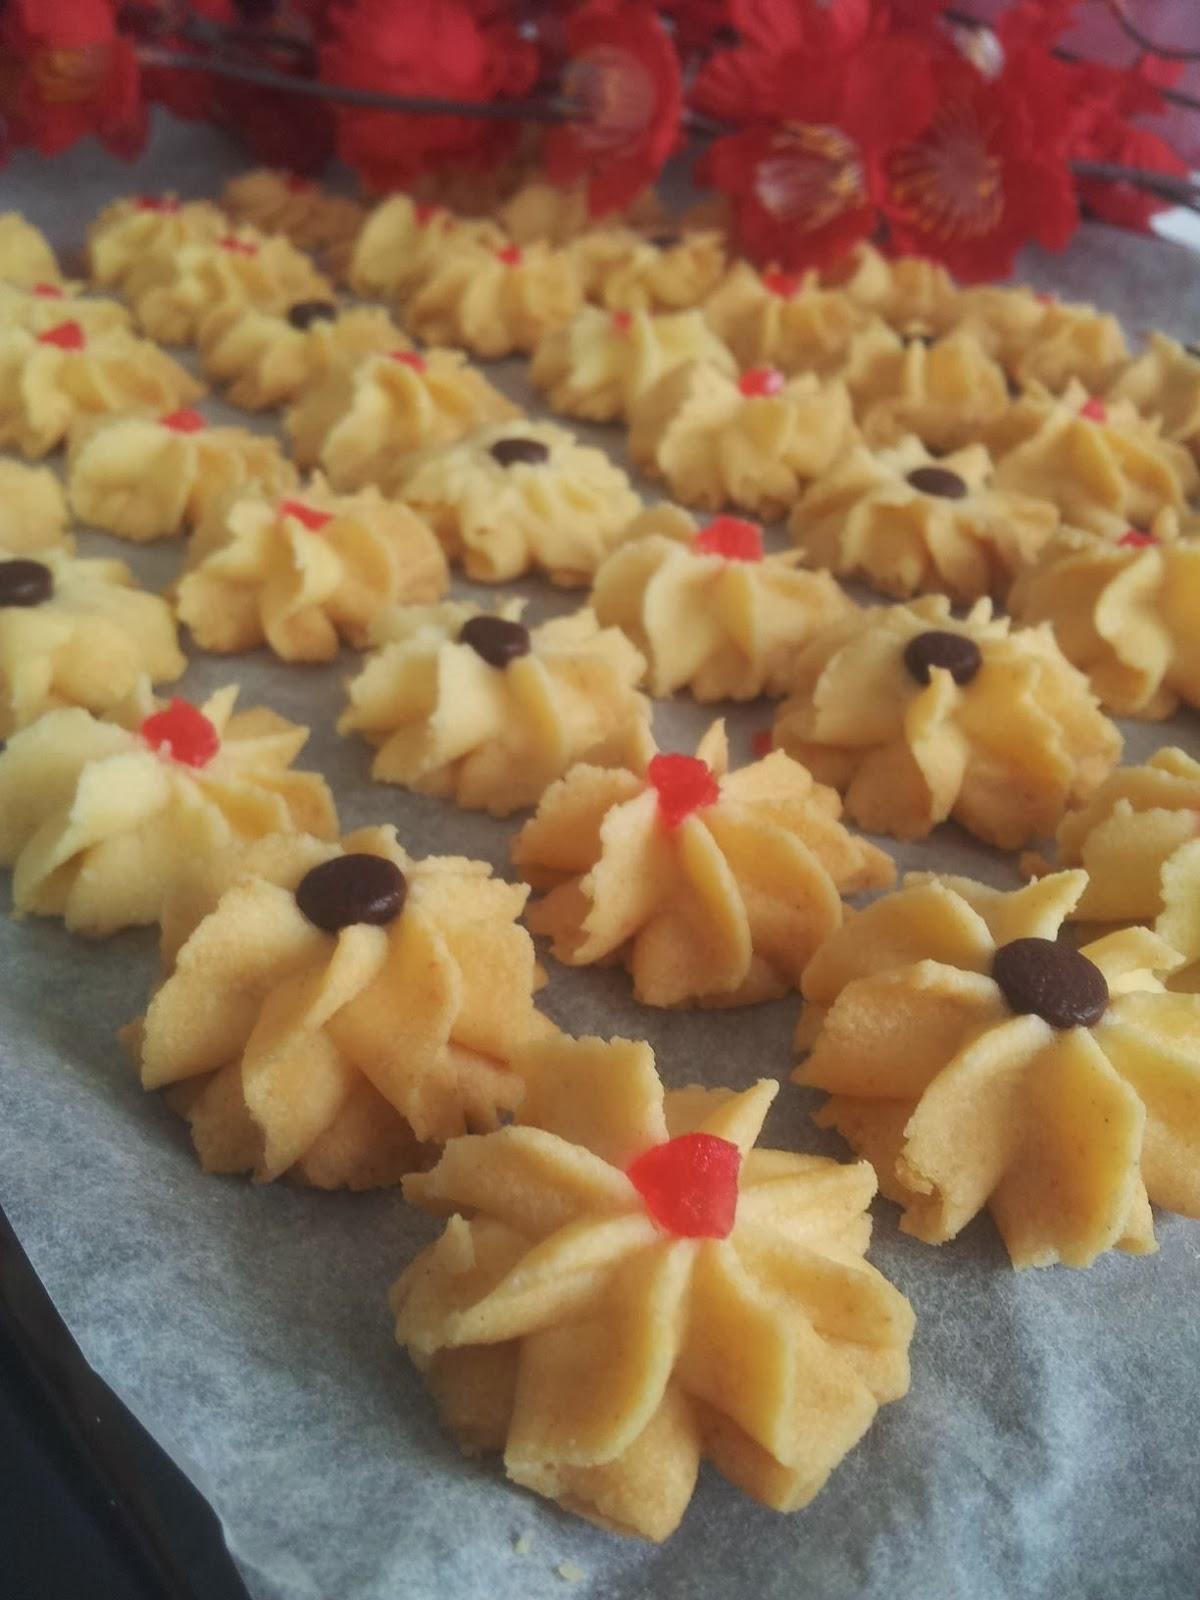 Cookie talk wendy kor baking recipes